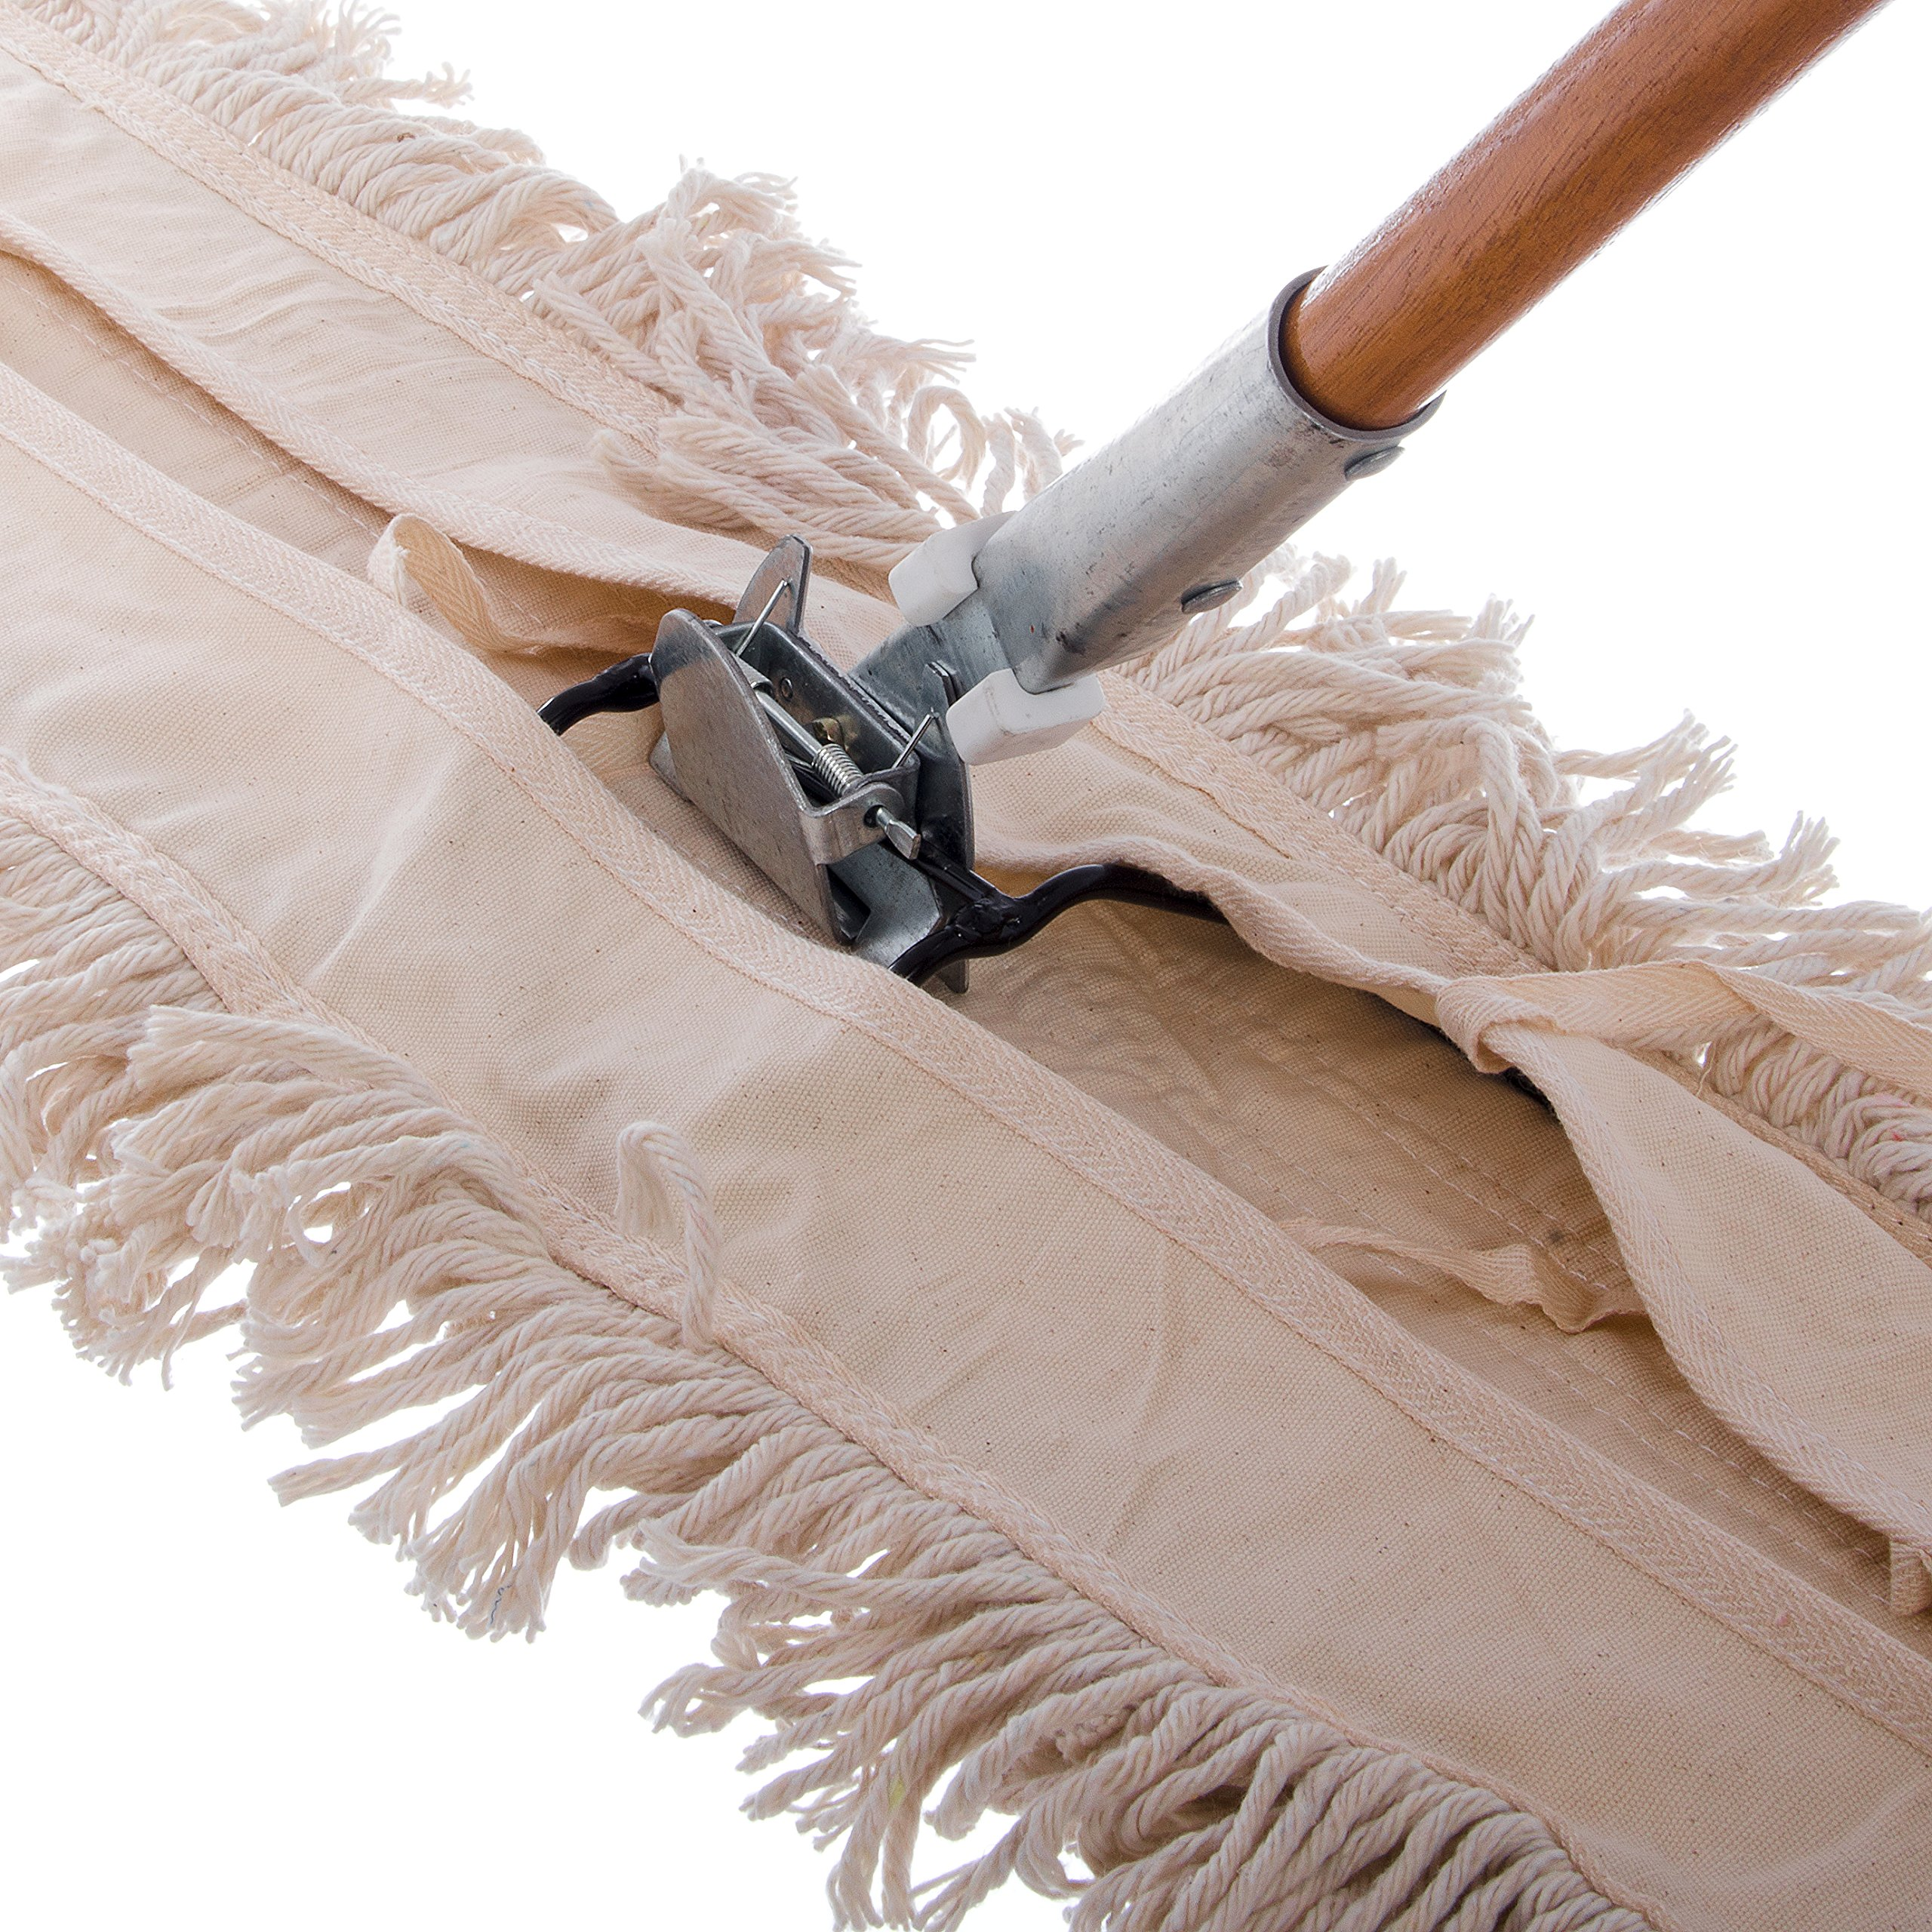 Carlisle 4585000 Wood Dust Mop Handle, 15/16'' Diameter x 60'' Length (Pack of 12) by Carlisle (Image #4)